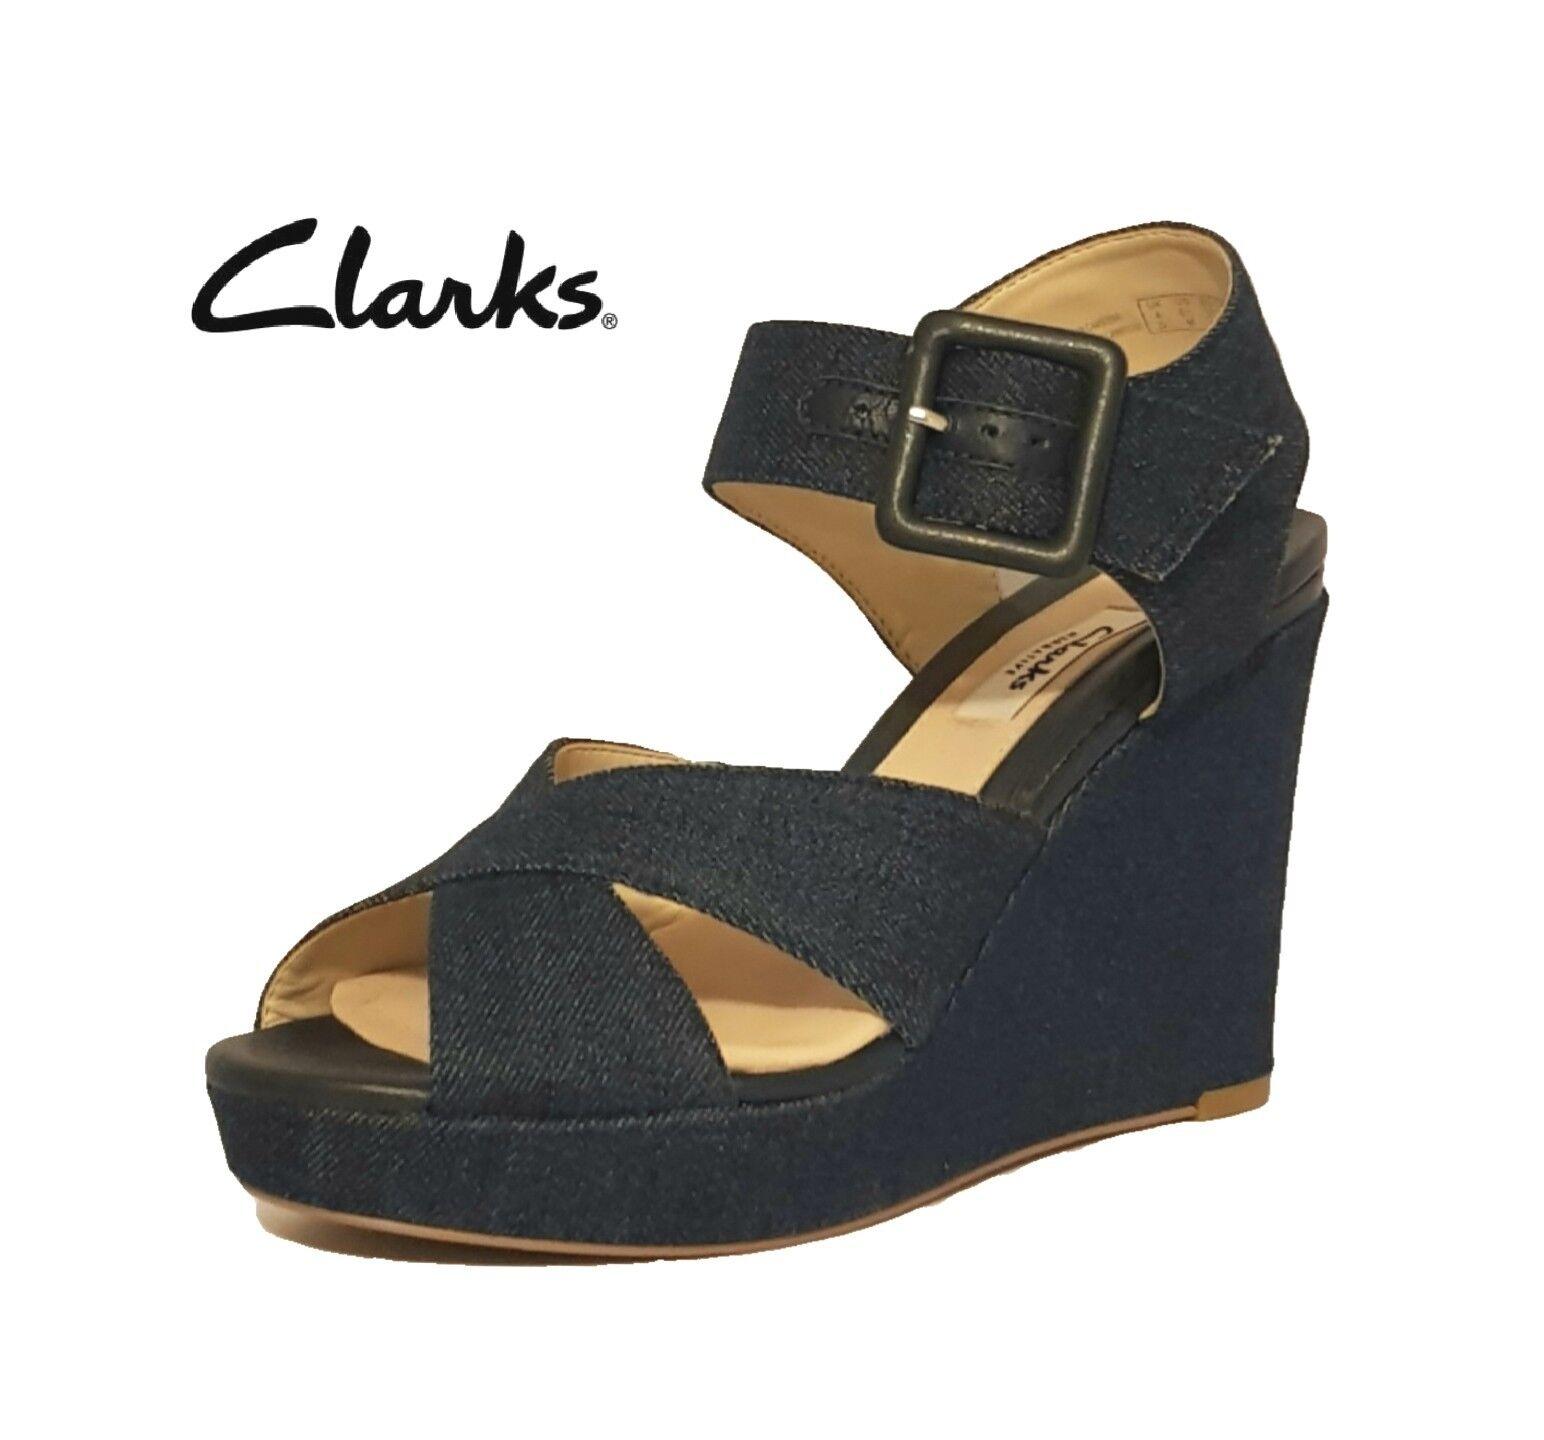 CLARKS LONAN GRACE bleu DENIM PLATFORM WEDGES BUCKLE SANDALS chaussures LADIES femmes